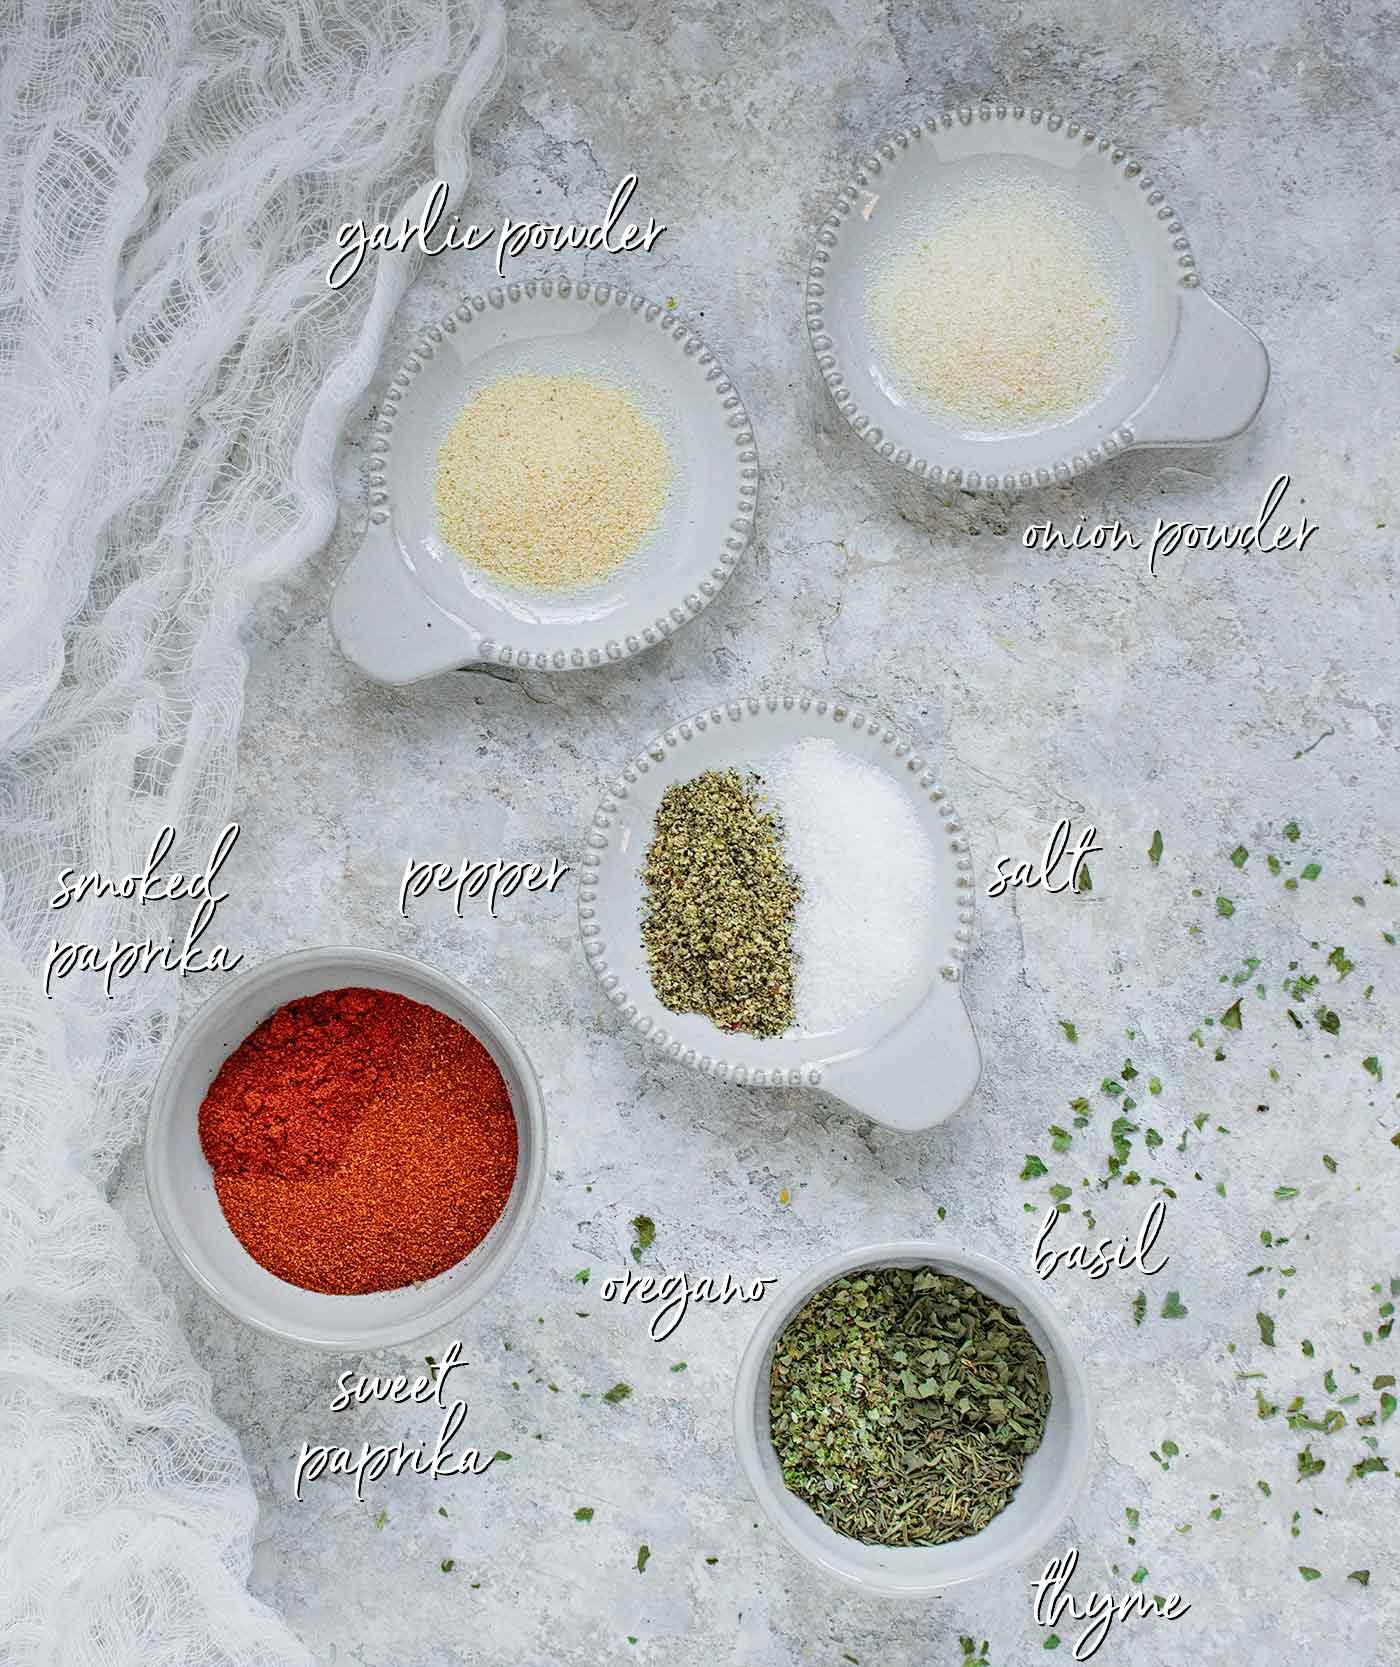 Ingredients of Creole seasoning in pinch bowls